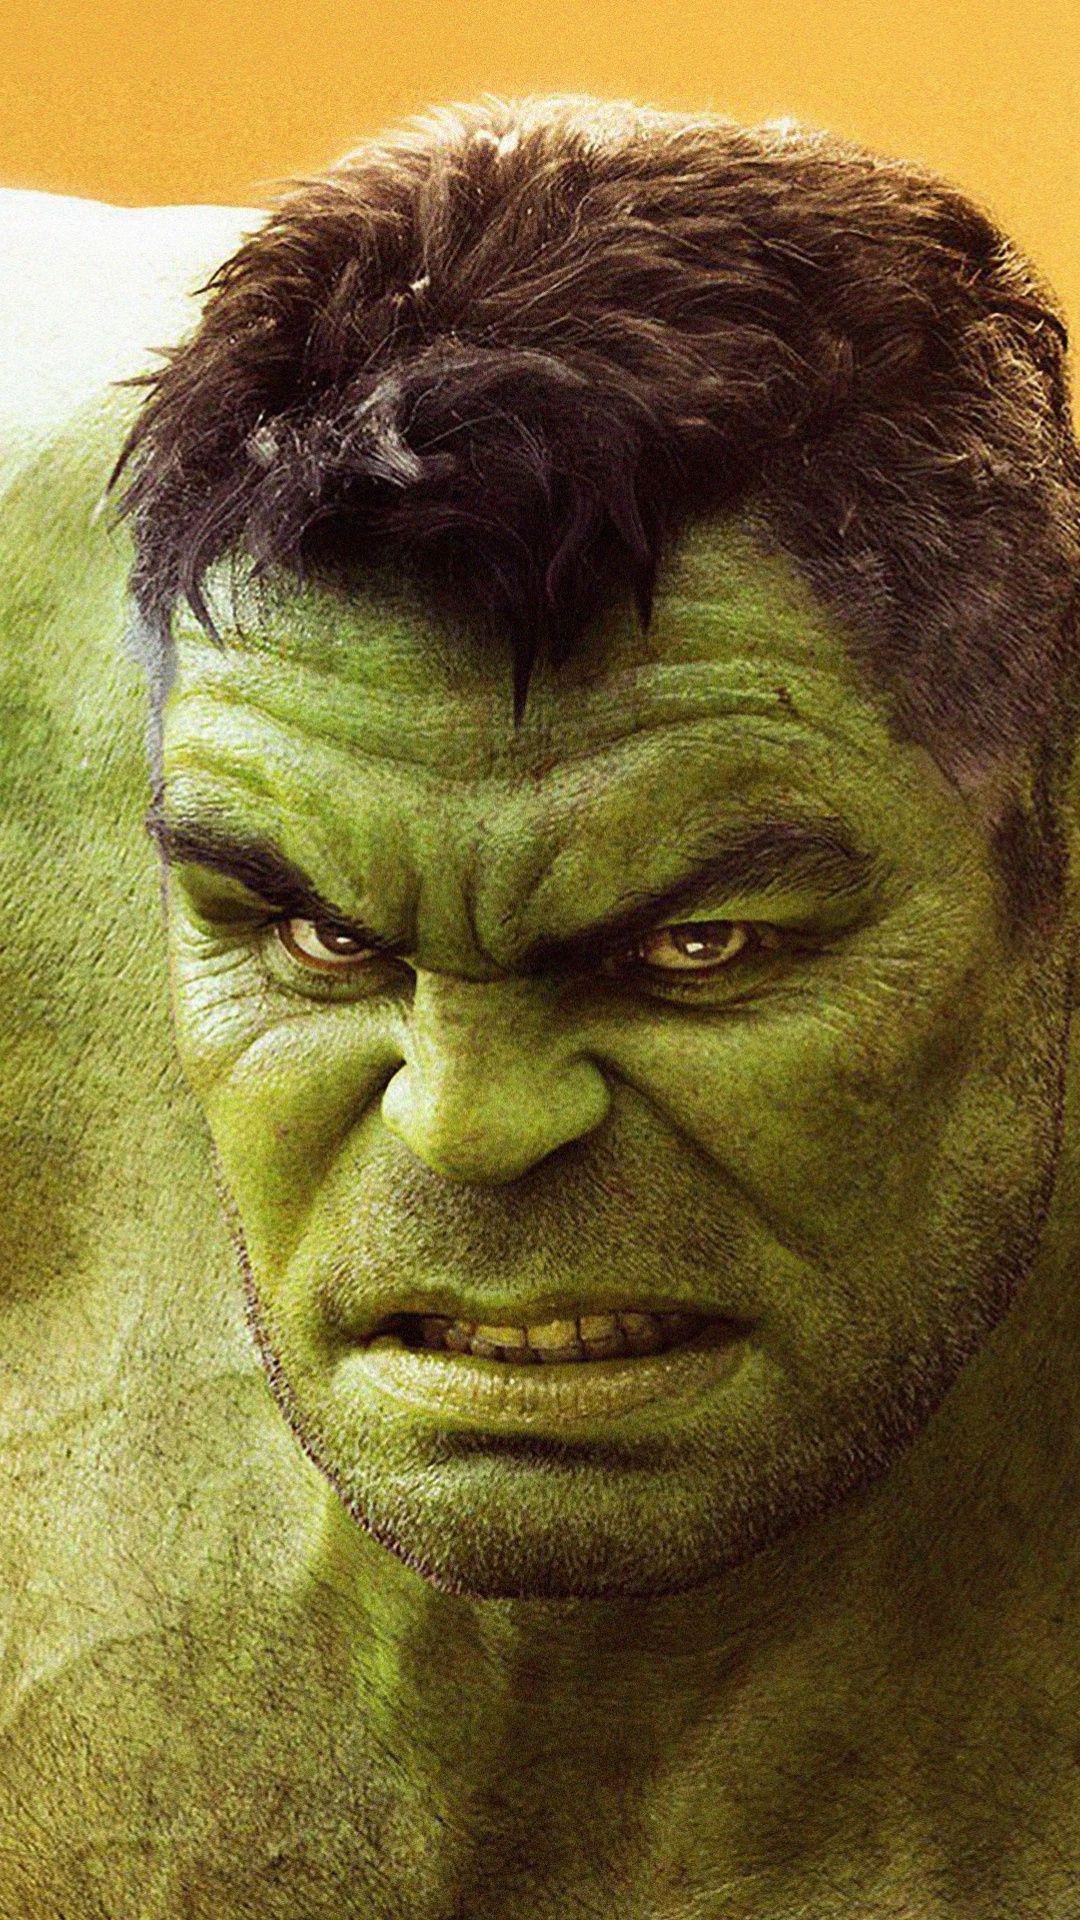 Mighty hulk green superhero movie Avengers Infinity War 1080x1920